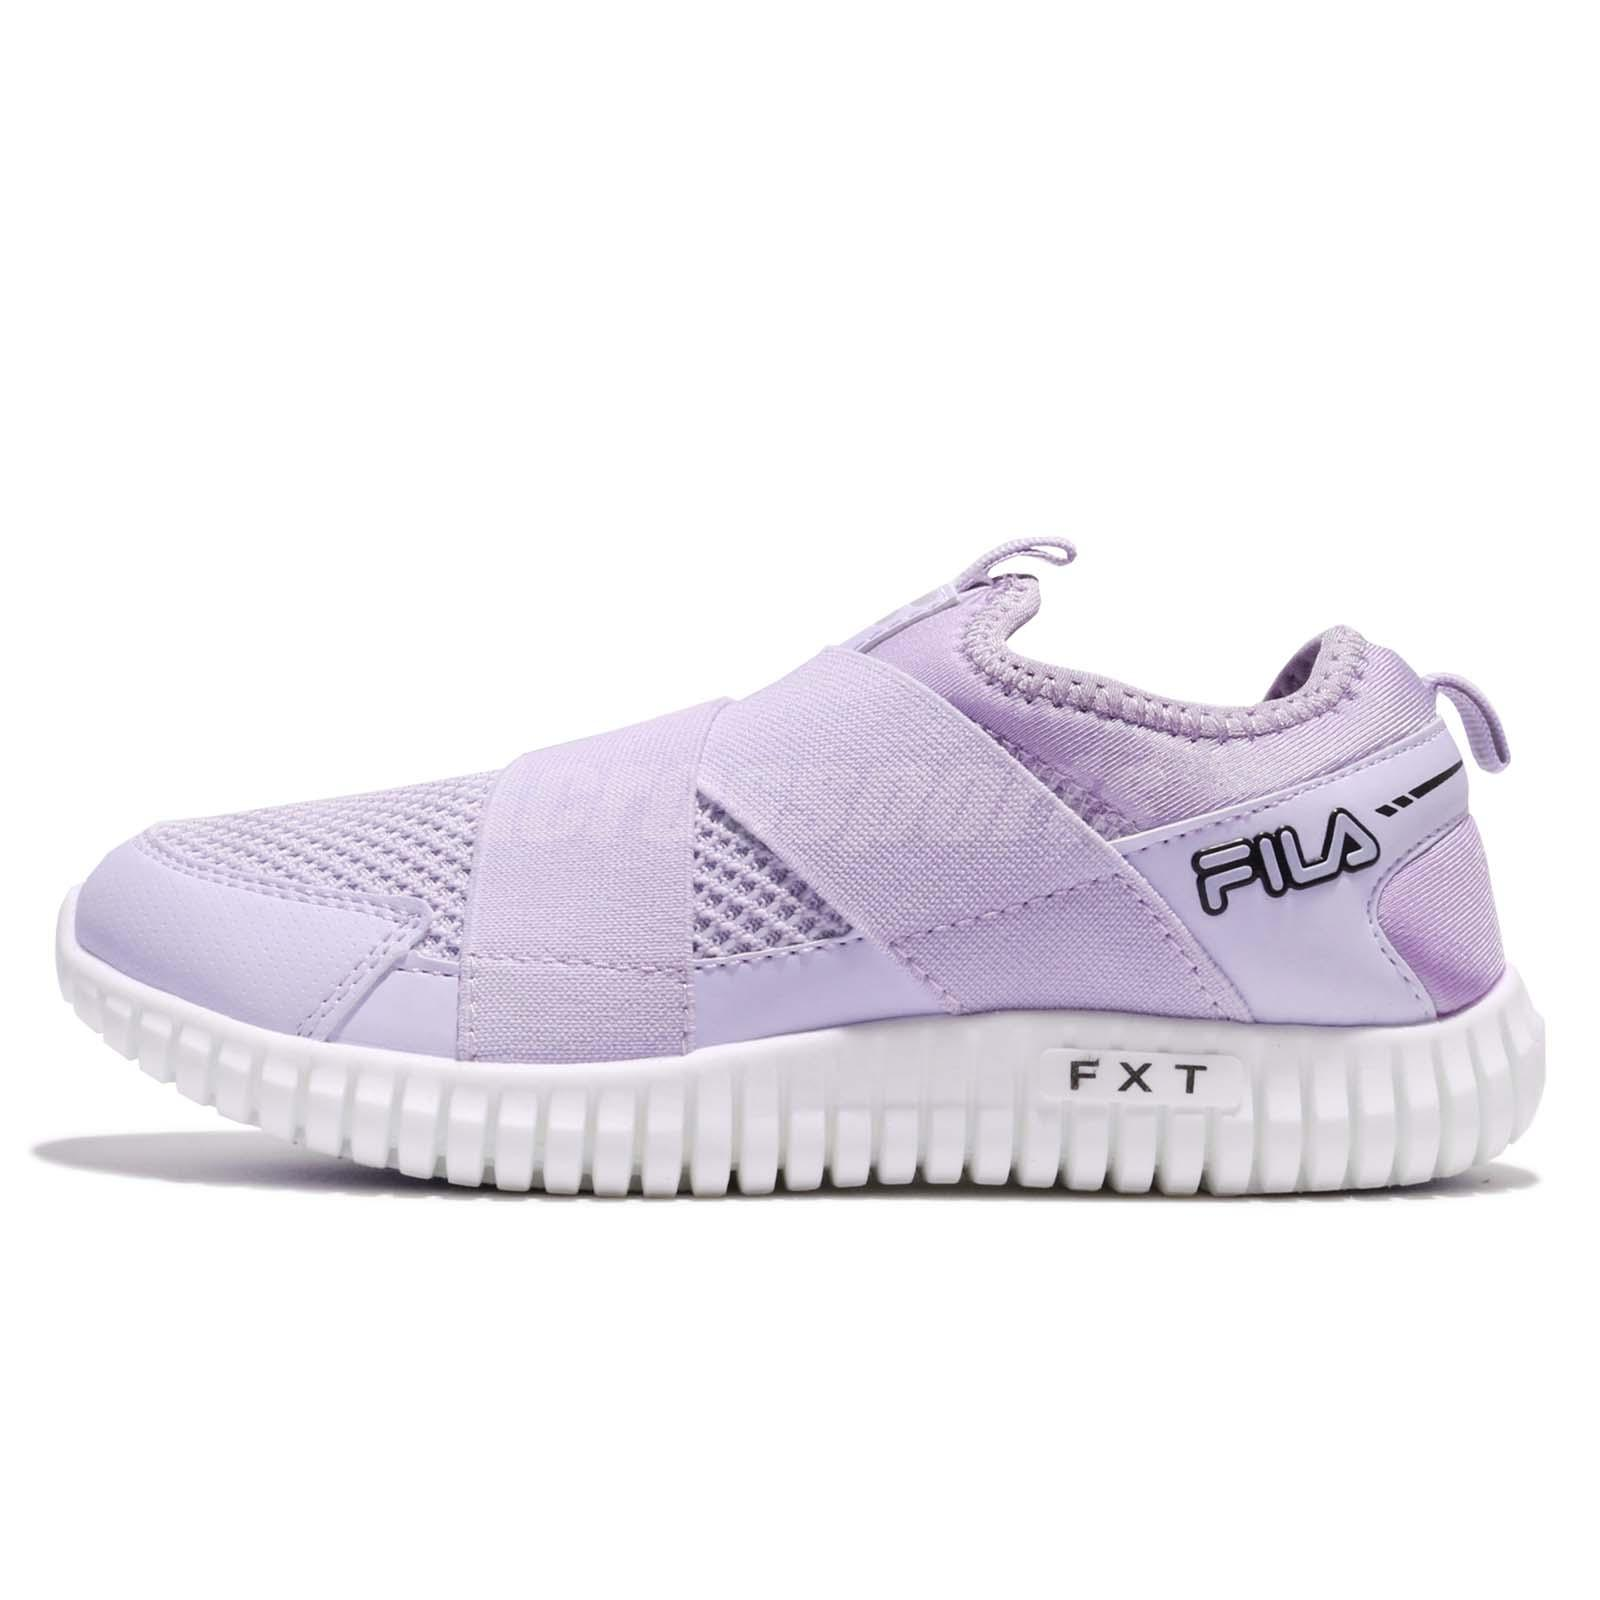 10f0b99f7b58 Fila F909R Venus Strap Purple White Women Slip On Walking Shoes Sneakers